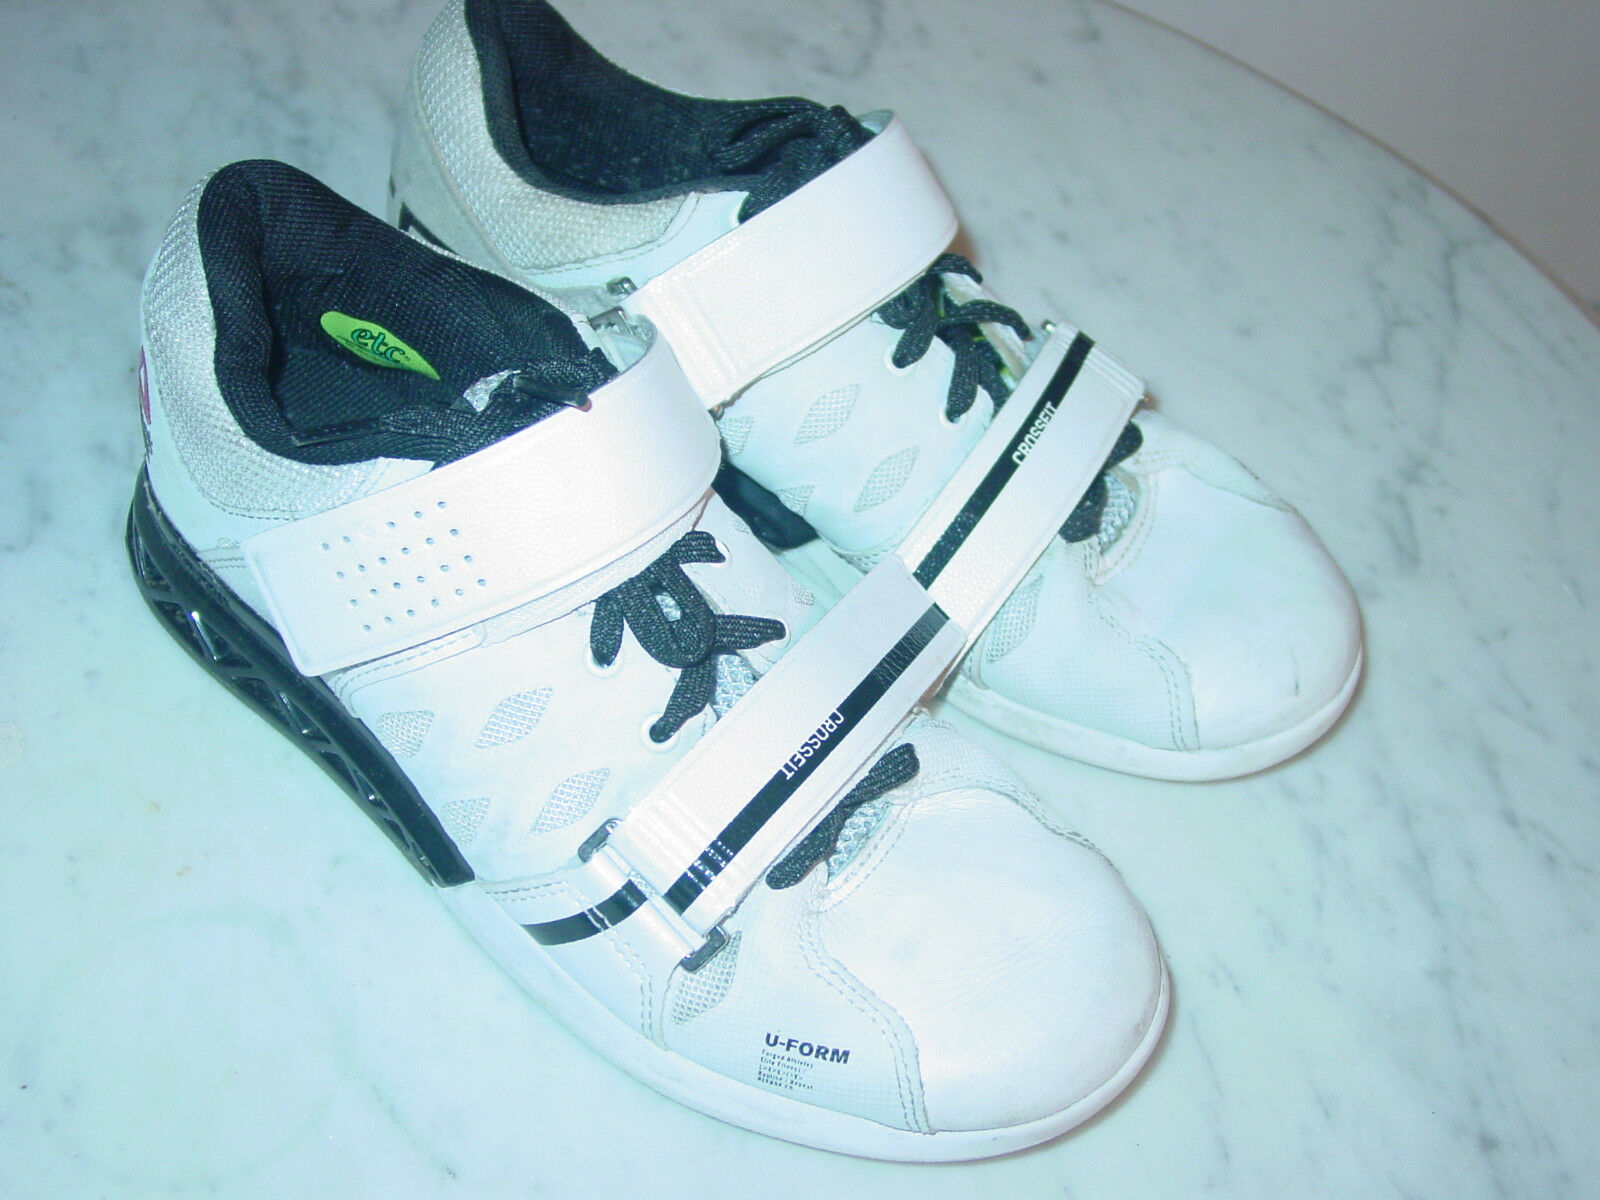 Para Mujer Reebok Crossfit Lifter Plus 2.0 M43656 Cross Training zapatos